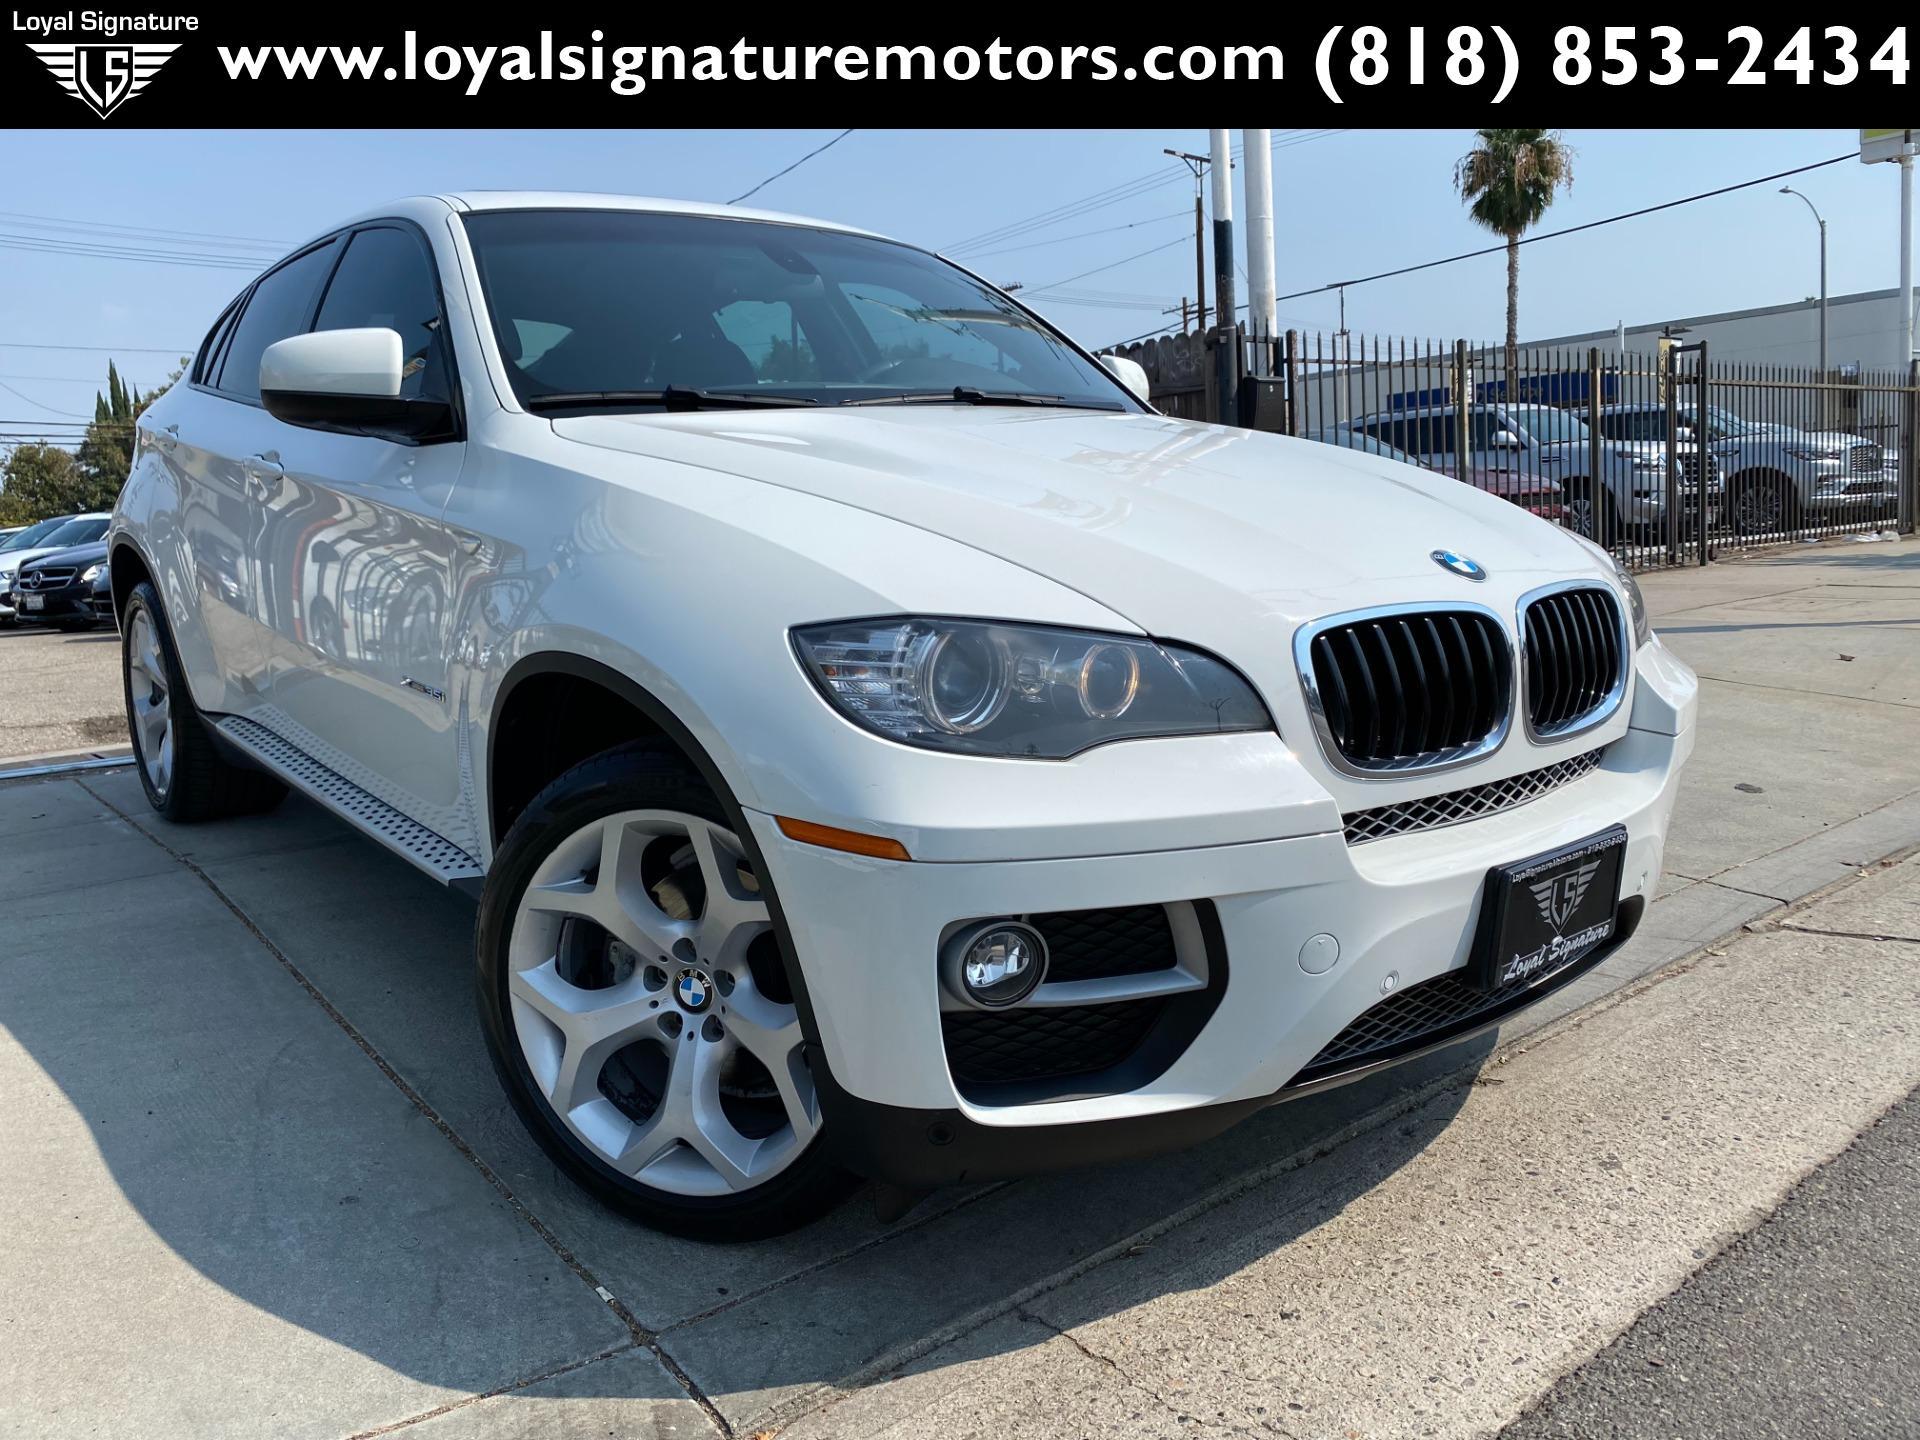 Used 2014 BMW X6 xDrive35i | Van Nuys, CA